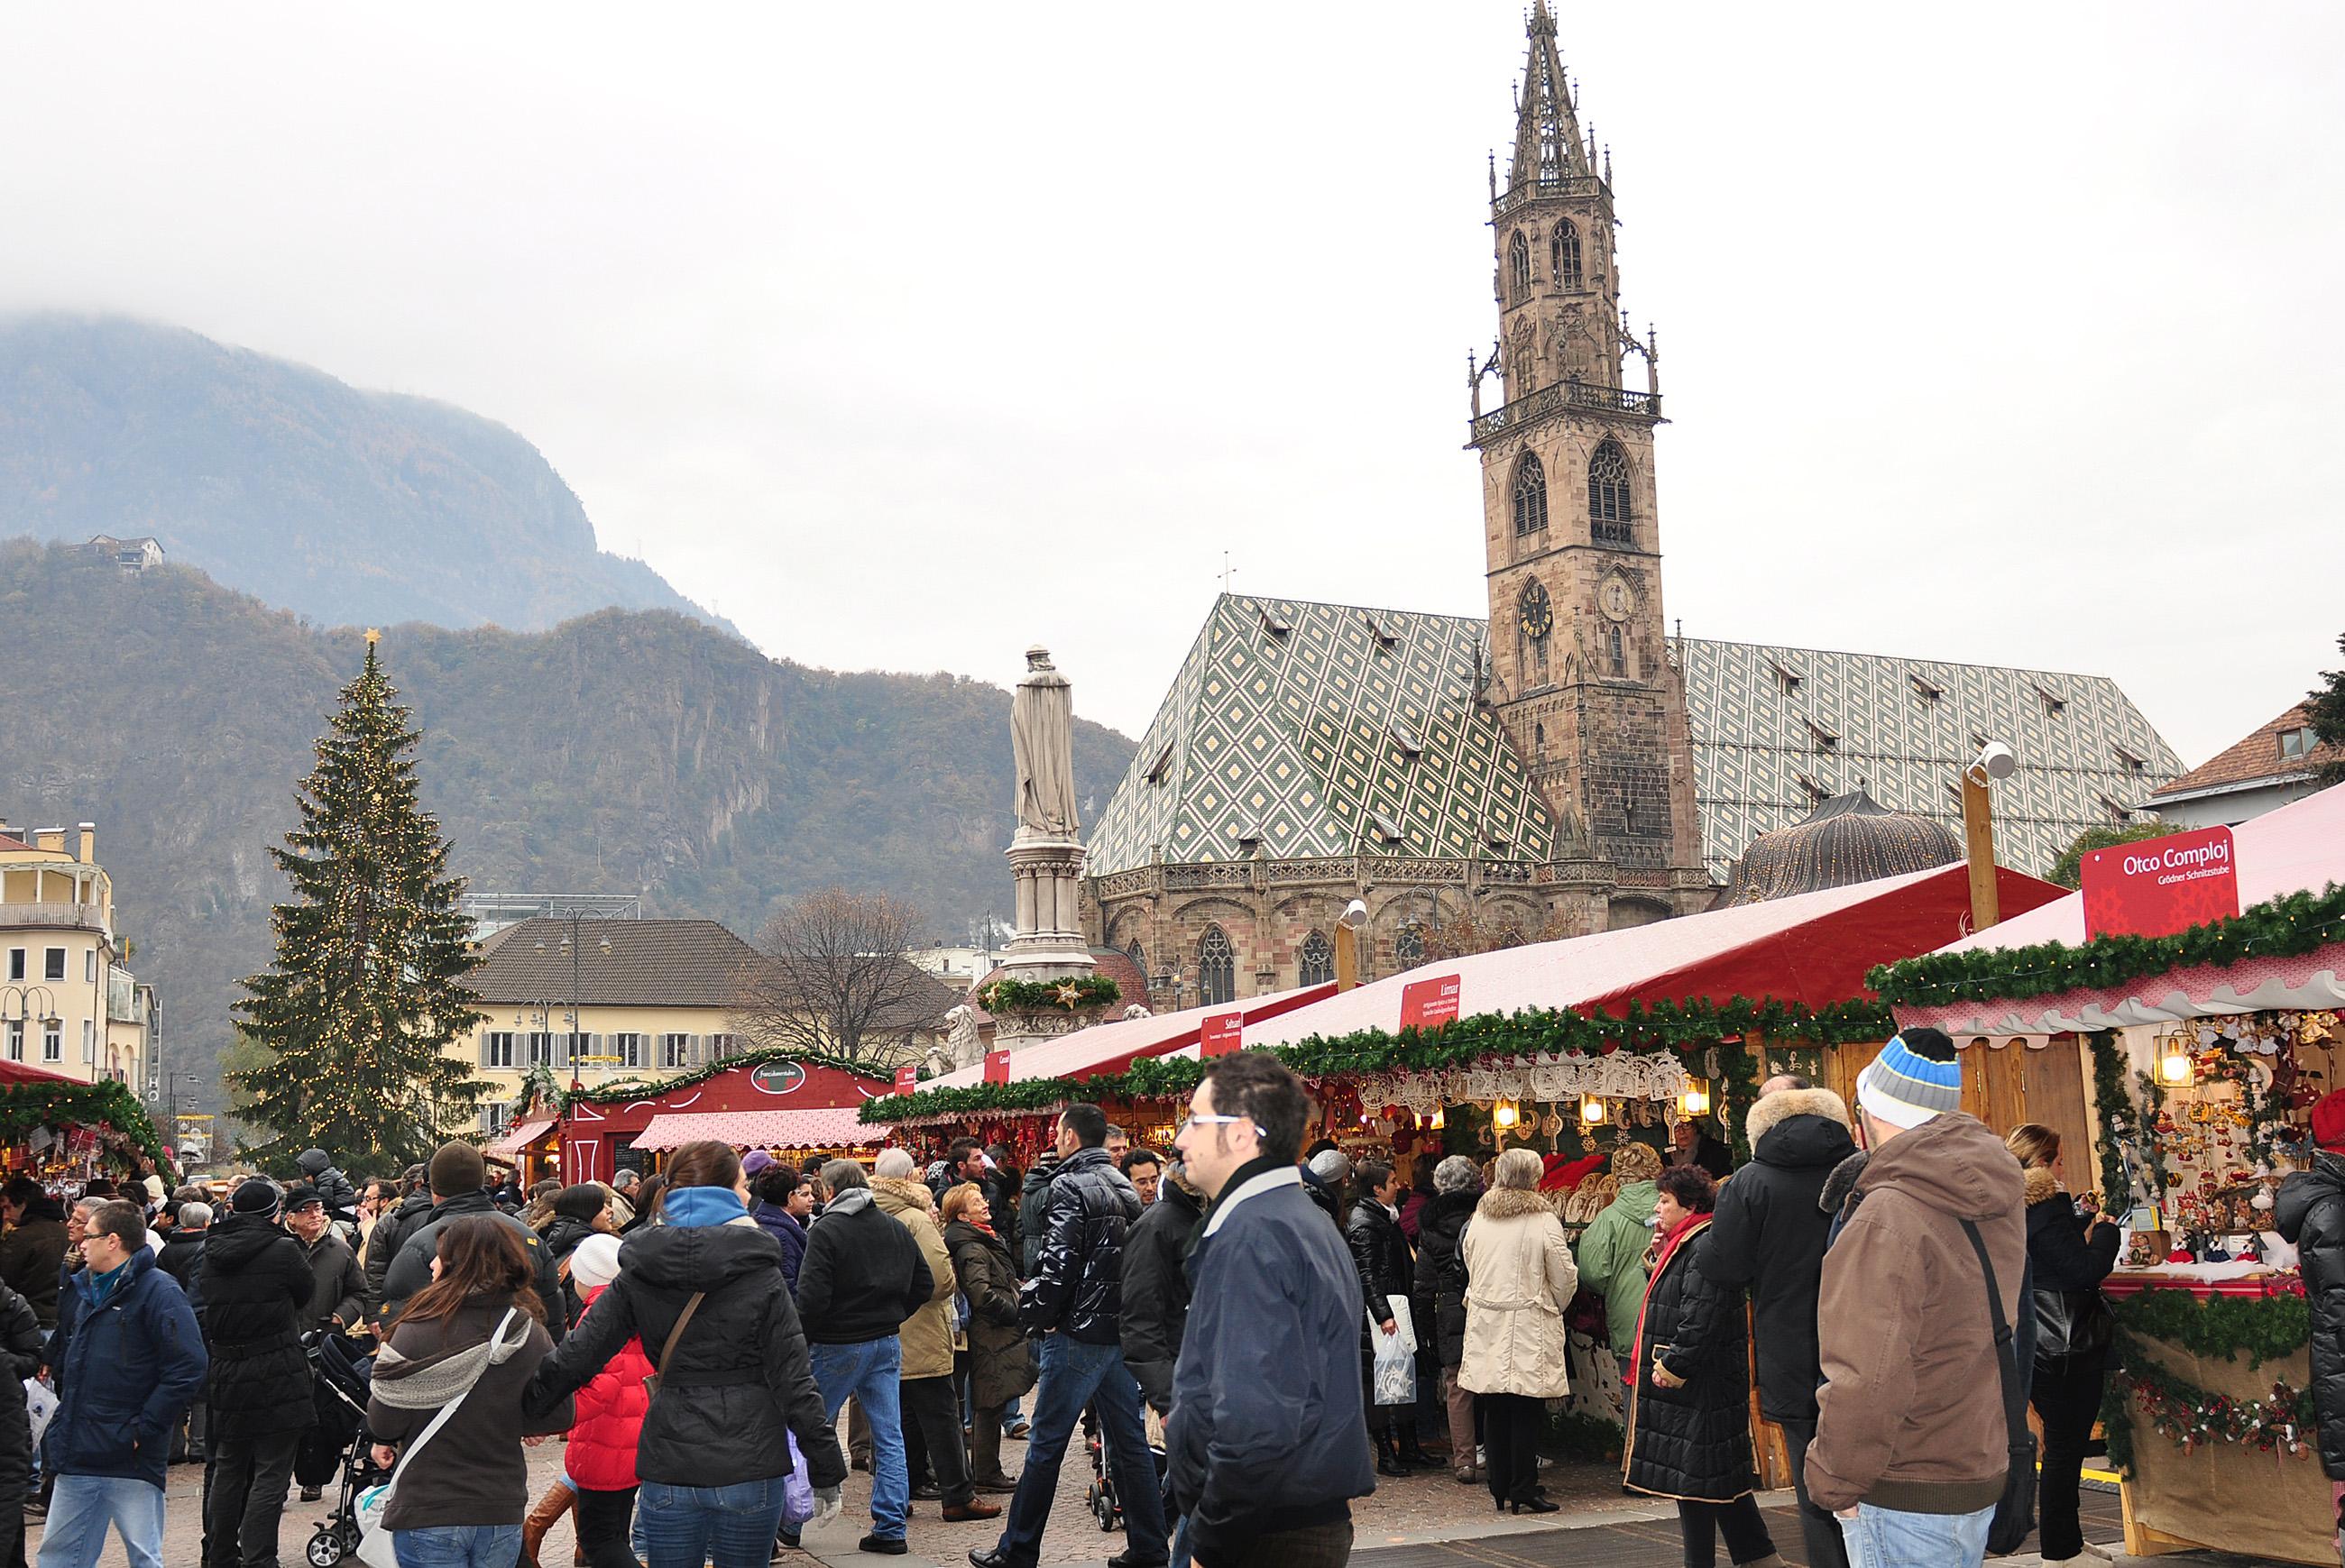 Mercatini Di Natale Bolzano Piazza Walther.Aria Di Natale A Bolzano In Piazza Walther E Arrivato L